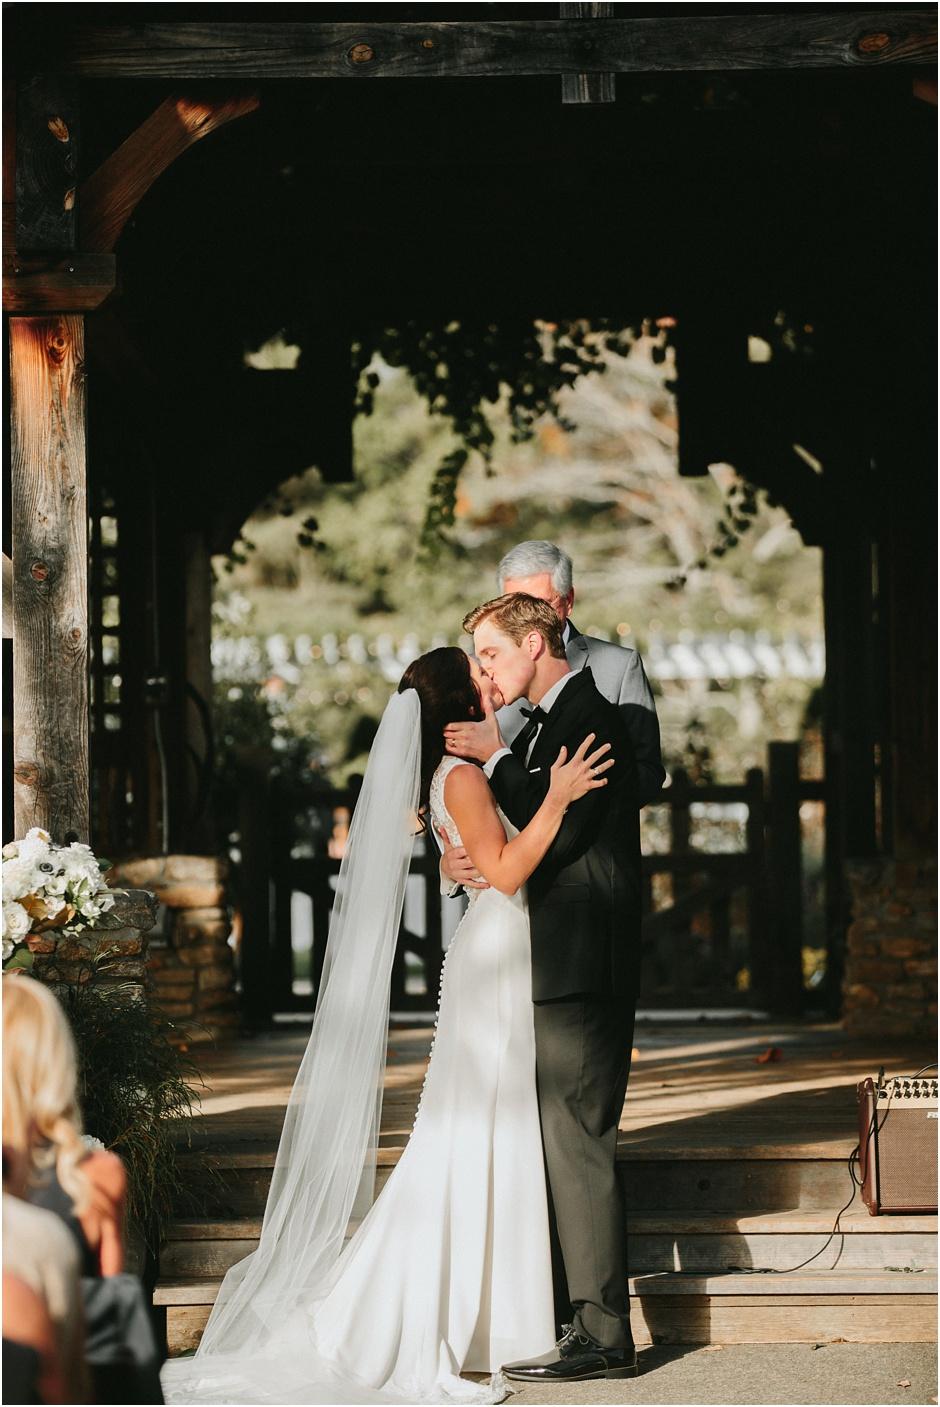 NC Arboretum Wedding | Amore Vita Photography_0027.jpg